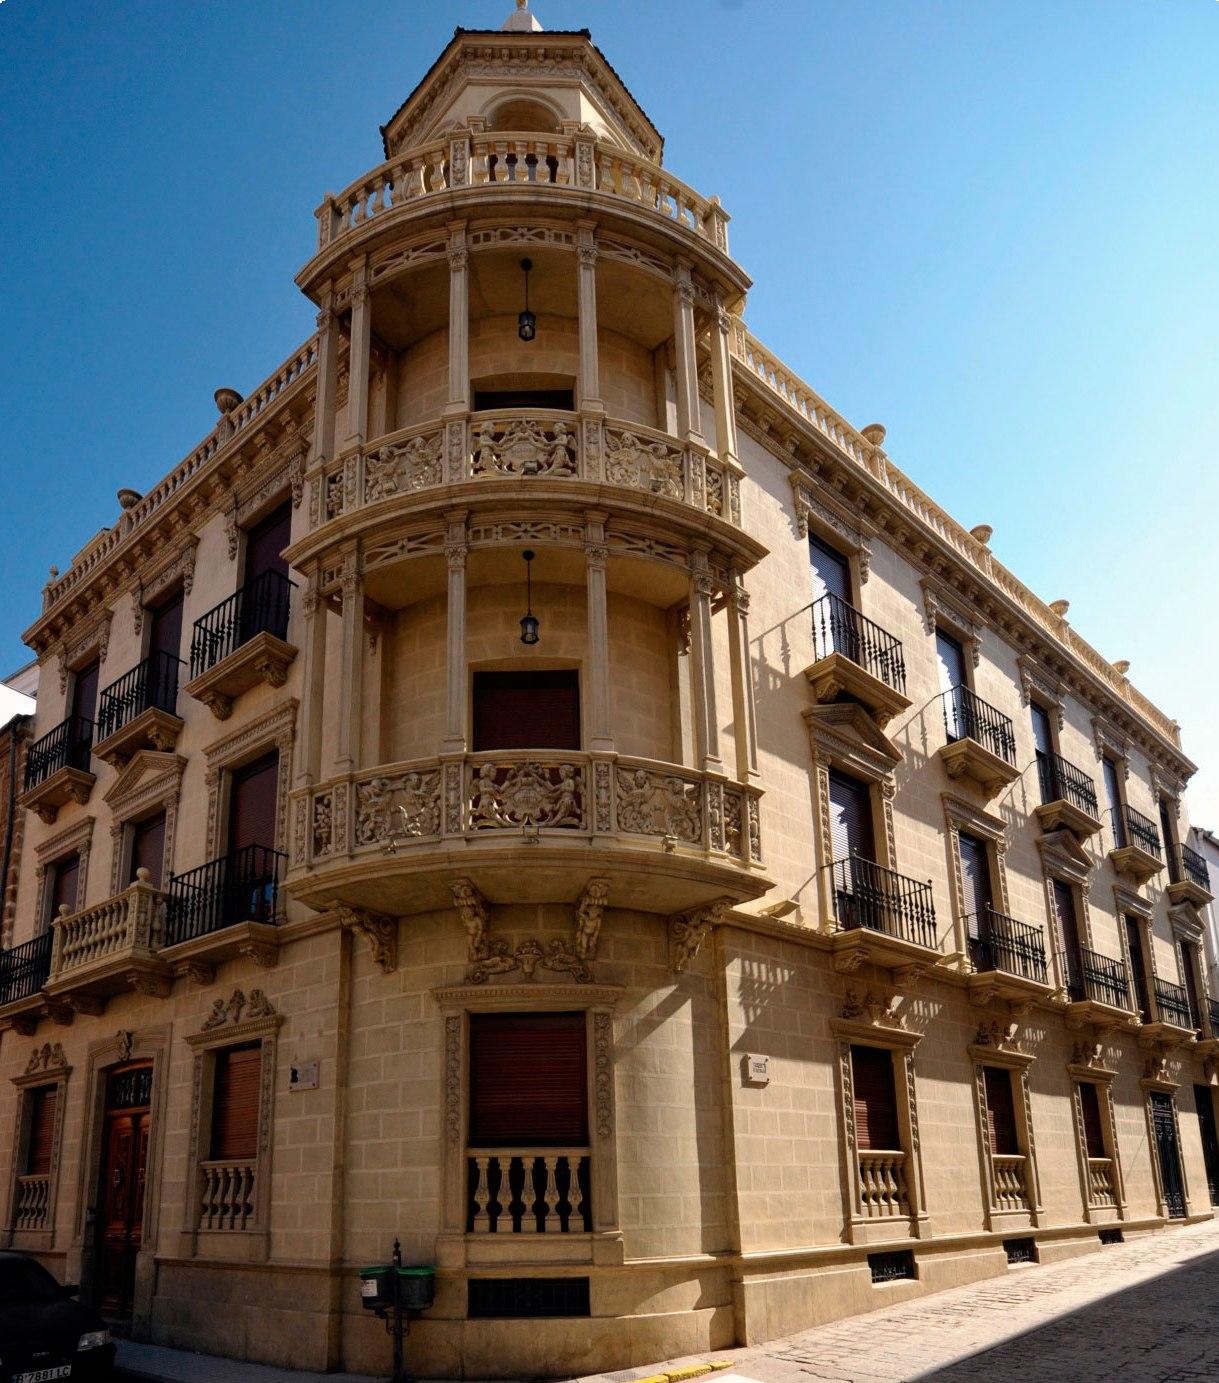 Antiguo Casino de Villanueva del Arzobispo